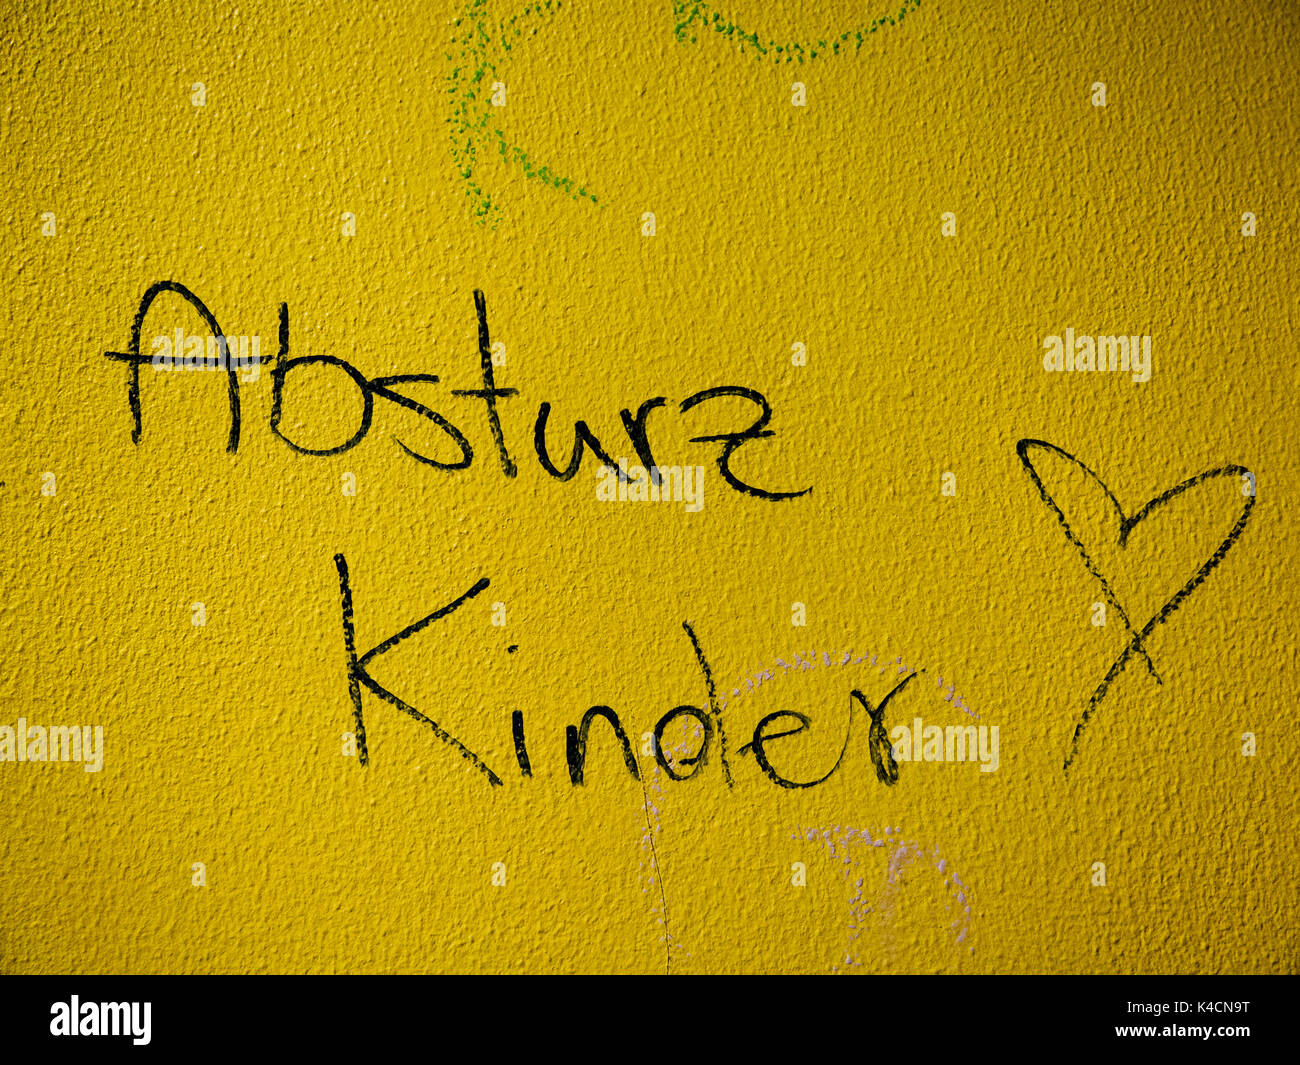 La cultura de la juventud, la niñez, la sociedad fronteriza de graffiti Imagen De Stock